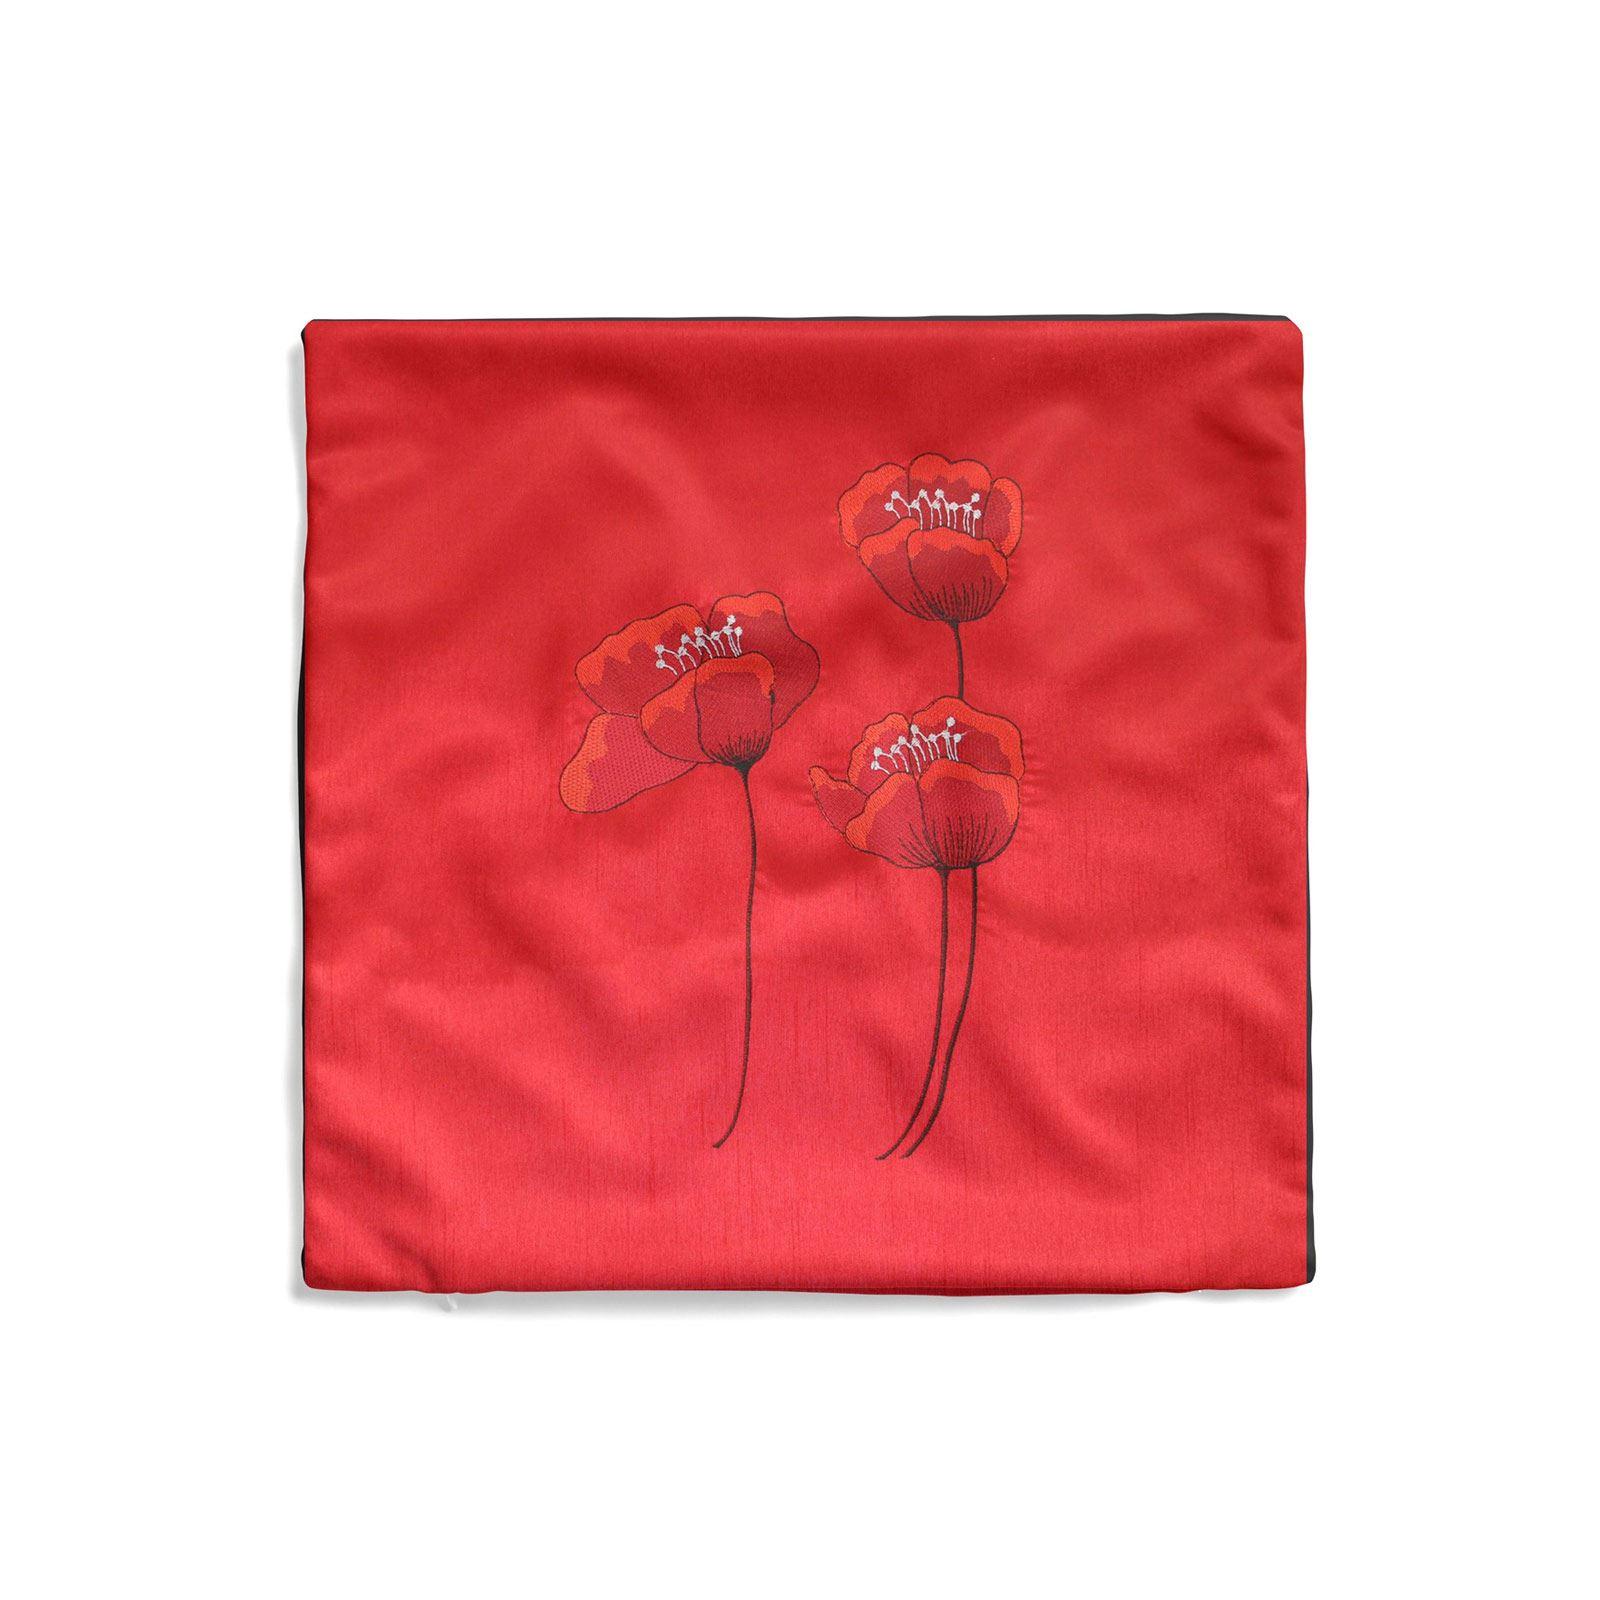 Vino-Tinto-Cushion-Covers-Coleccion-17-034-18-034-43cm-45cm-Cubierta miniatura 33